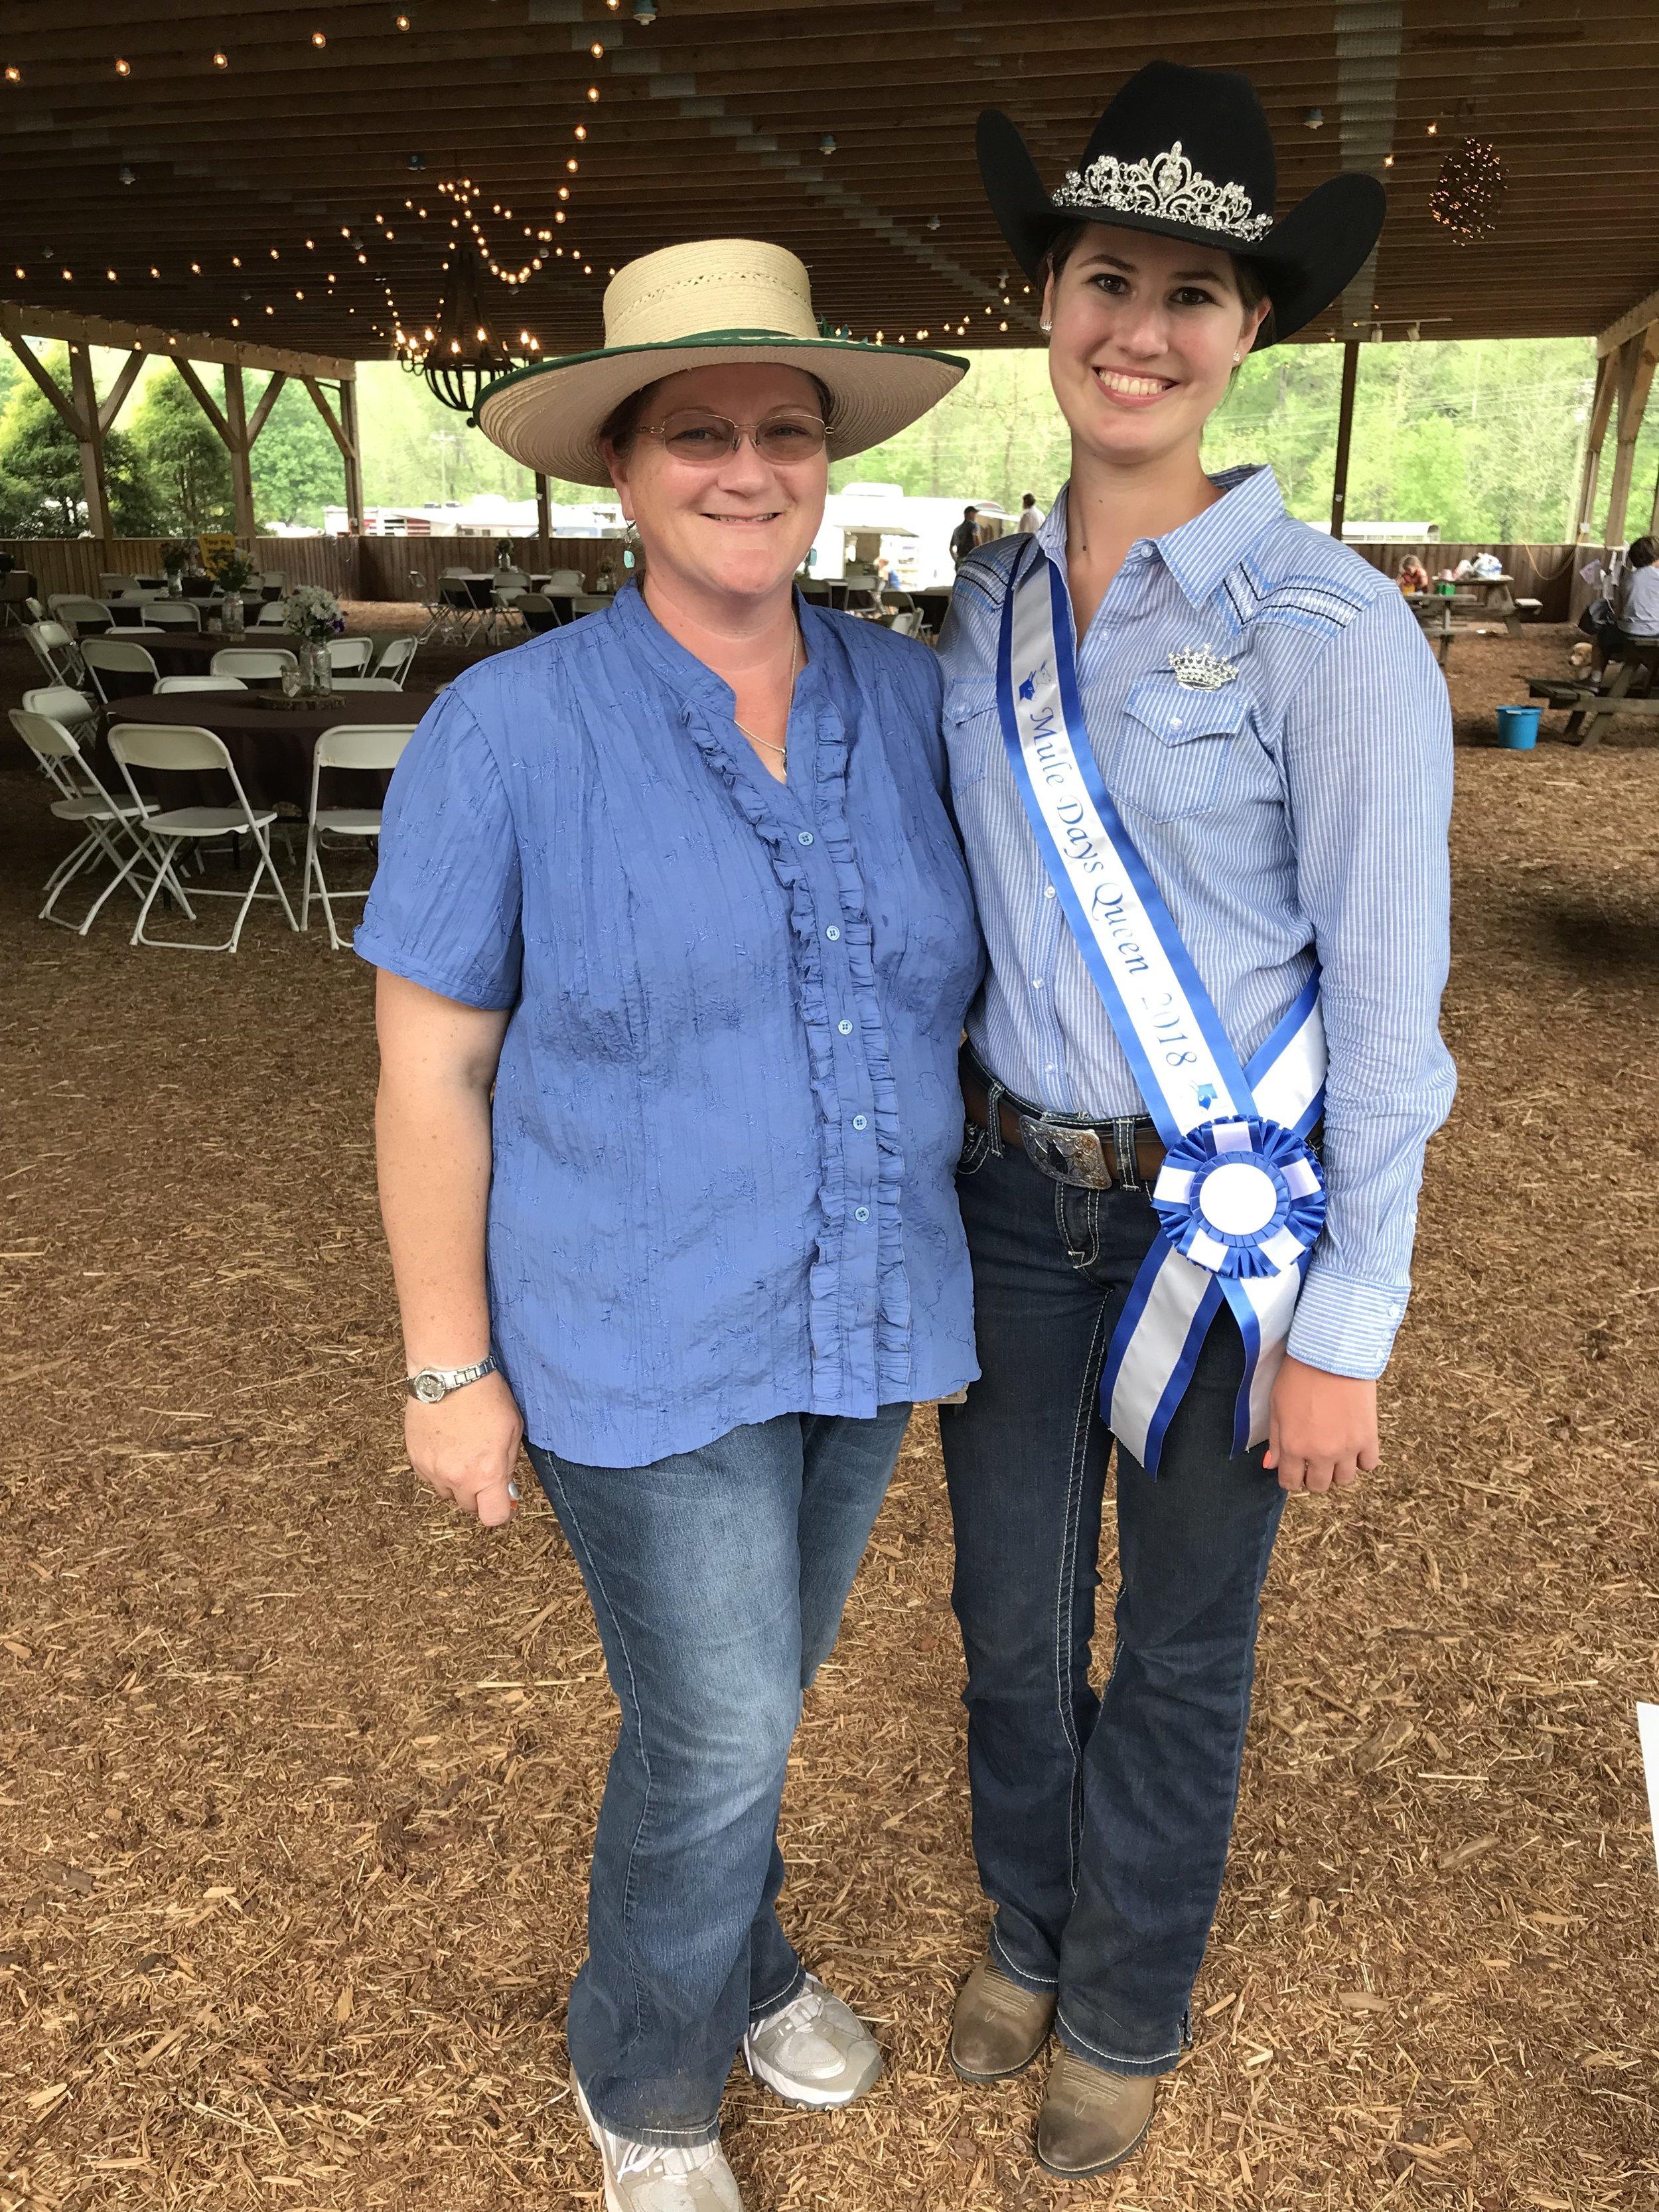 Shannon St. Clair Hoffman and Morgan Jones 2018 Mule Days Queen